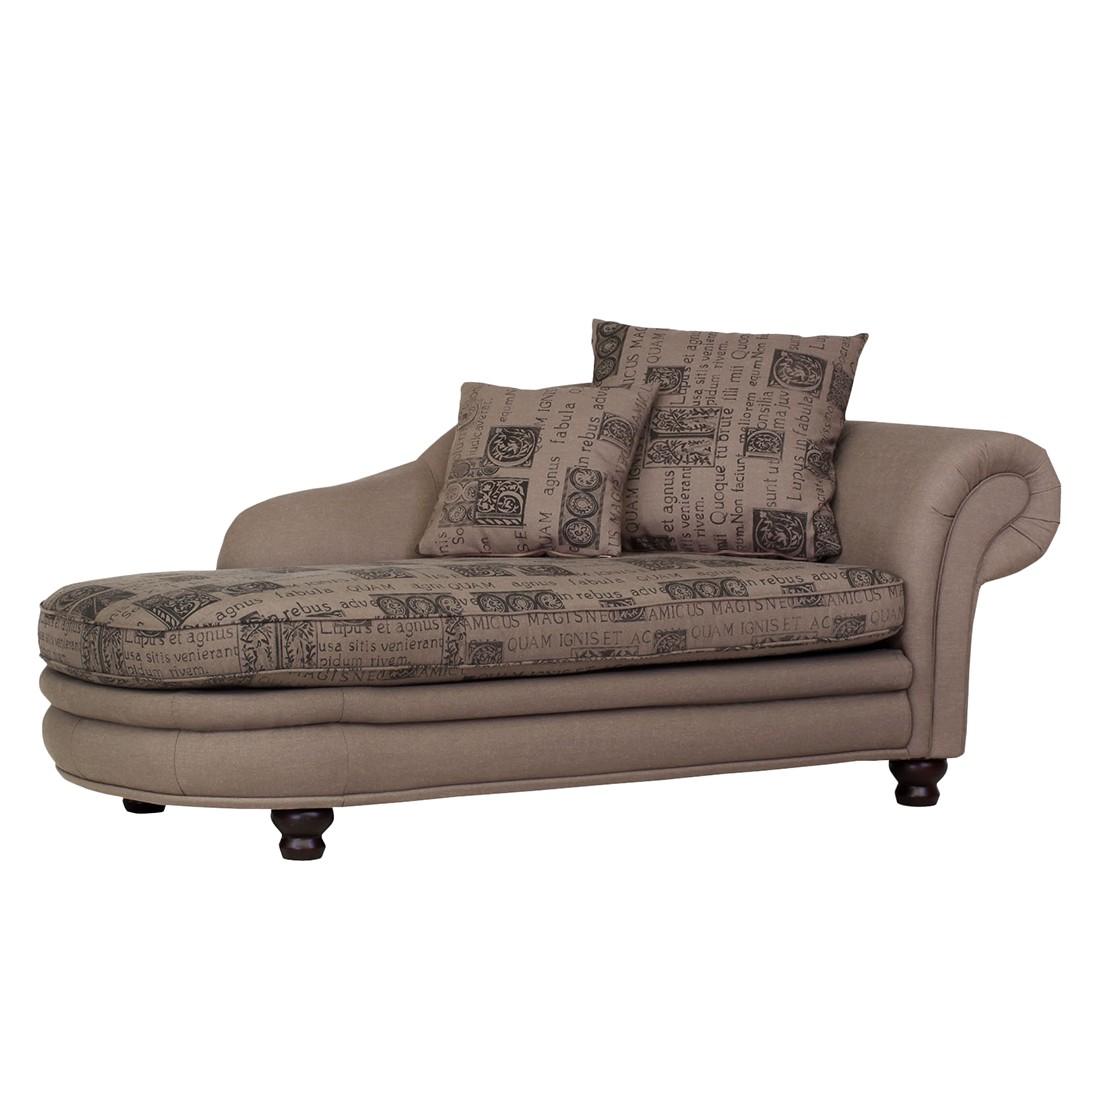 recamiere rokko webstoff braun armlehne rechts maison. Black Bedroom Furniture Sets. Home Design Ideas